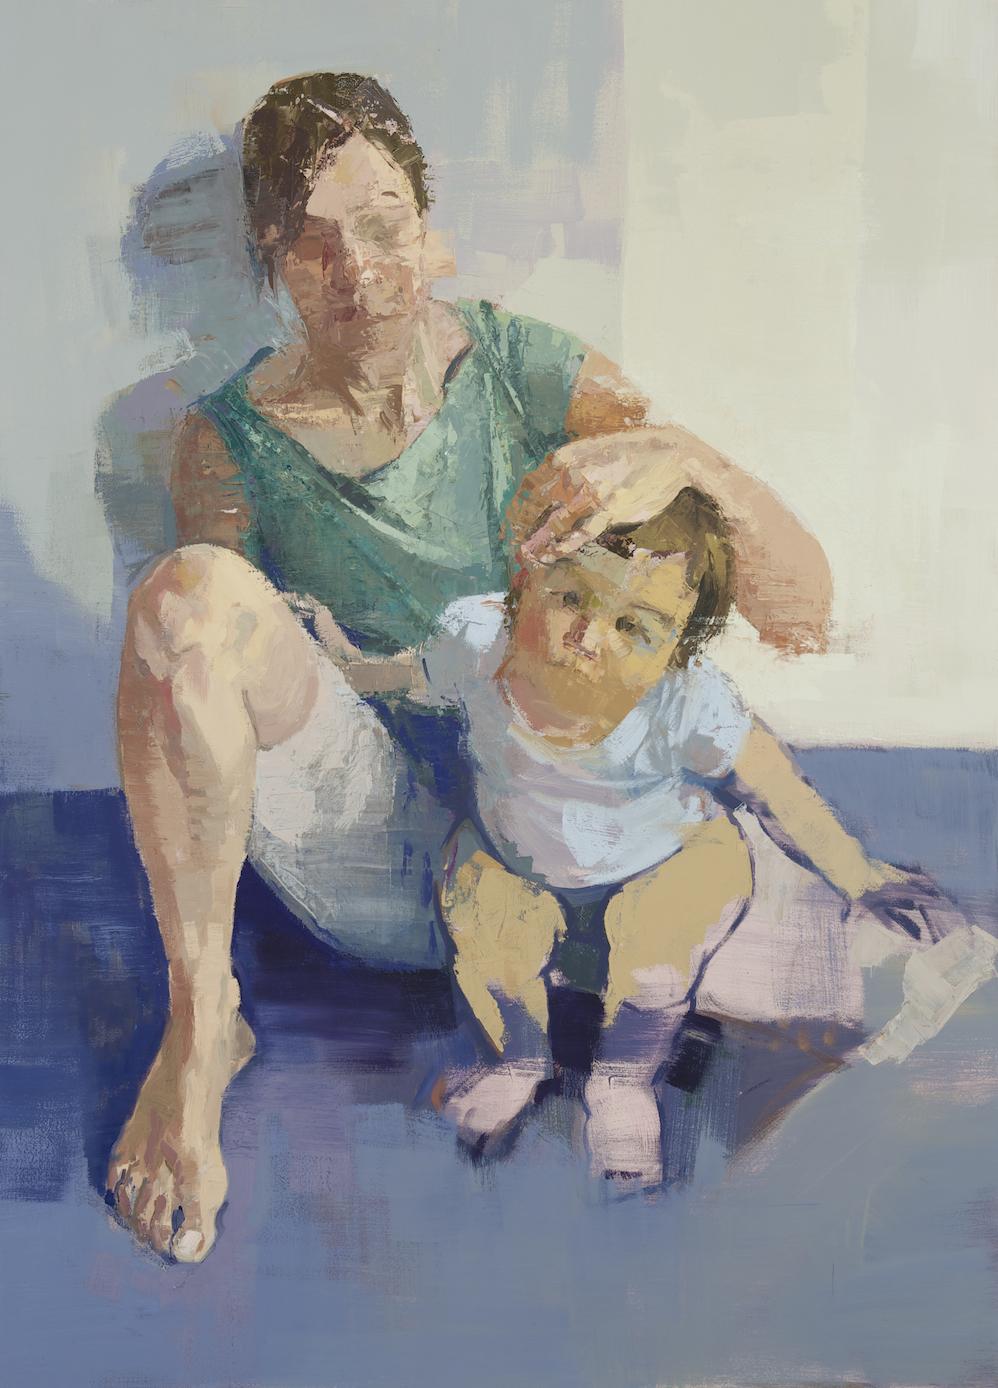 Self-portrait with Bea